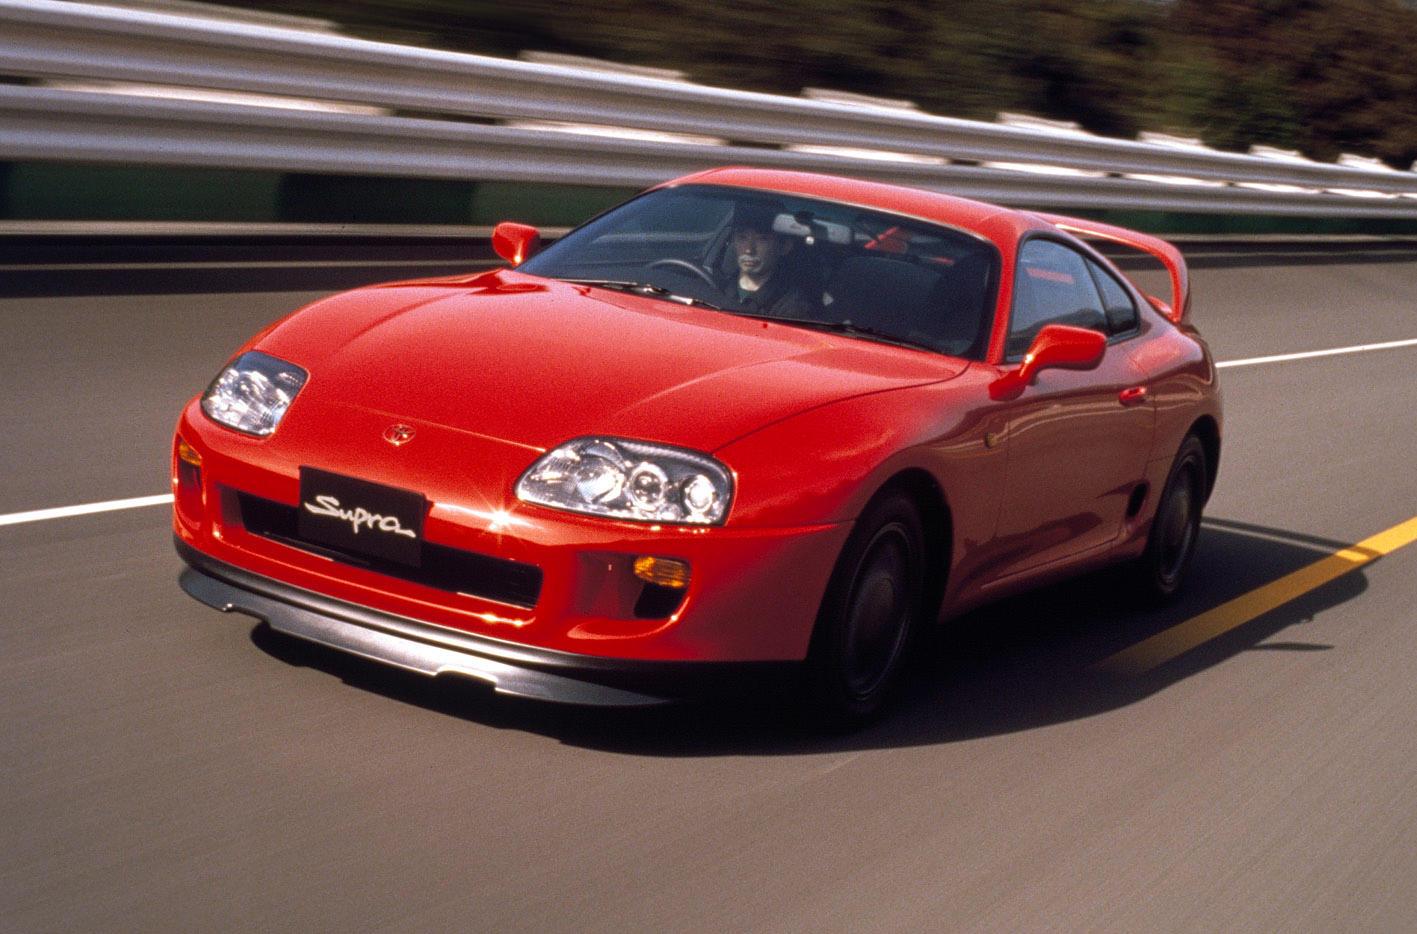 Top 10 masini supraapreciate - Top 10 masini supraapreciate